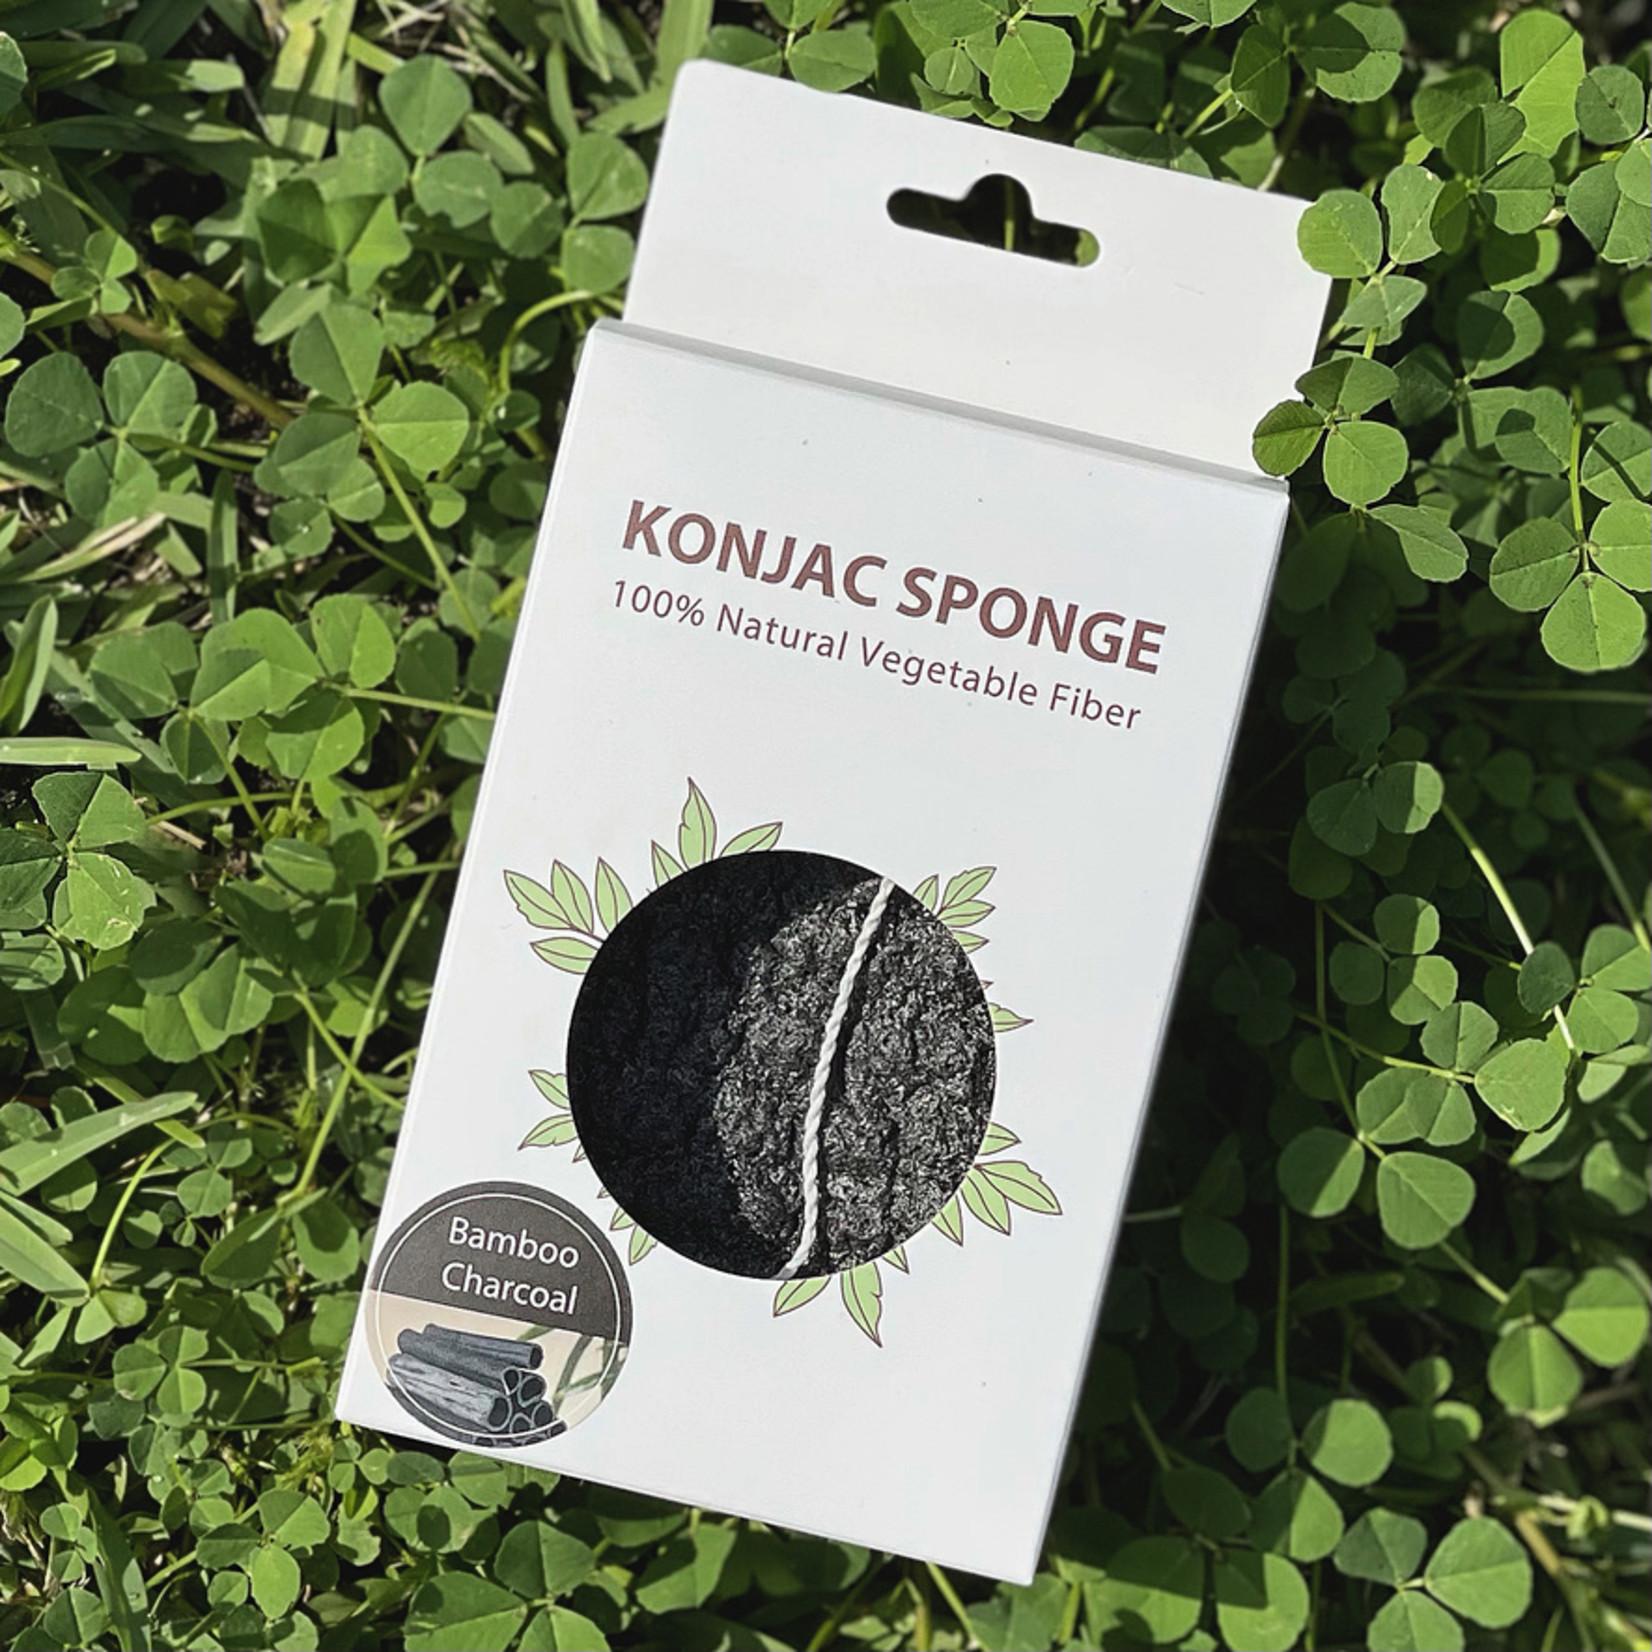 Eco Revolution Konjac Sponge Body Bamboo Charcoal